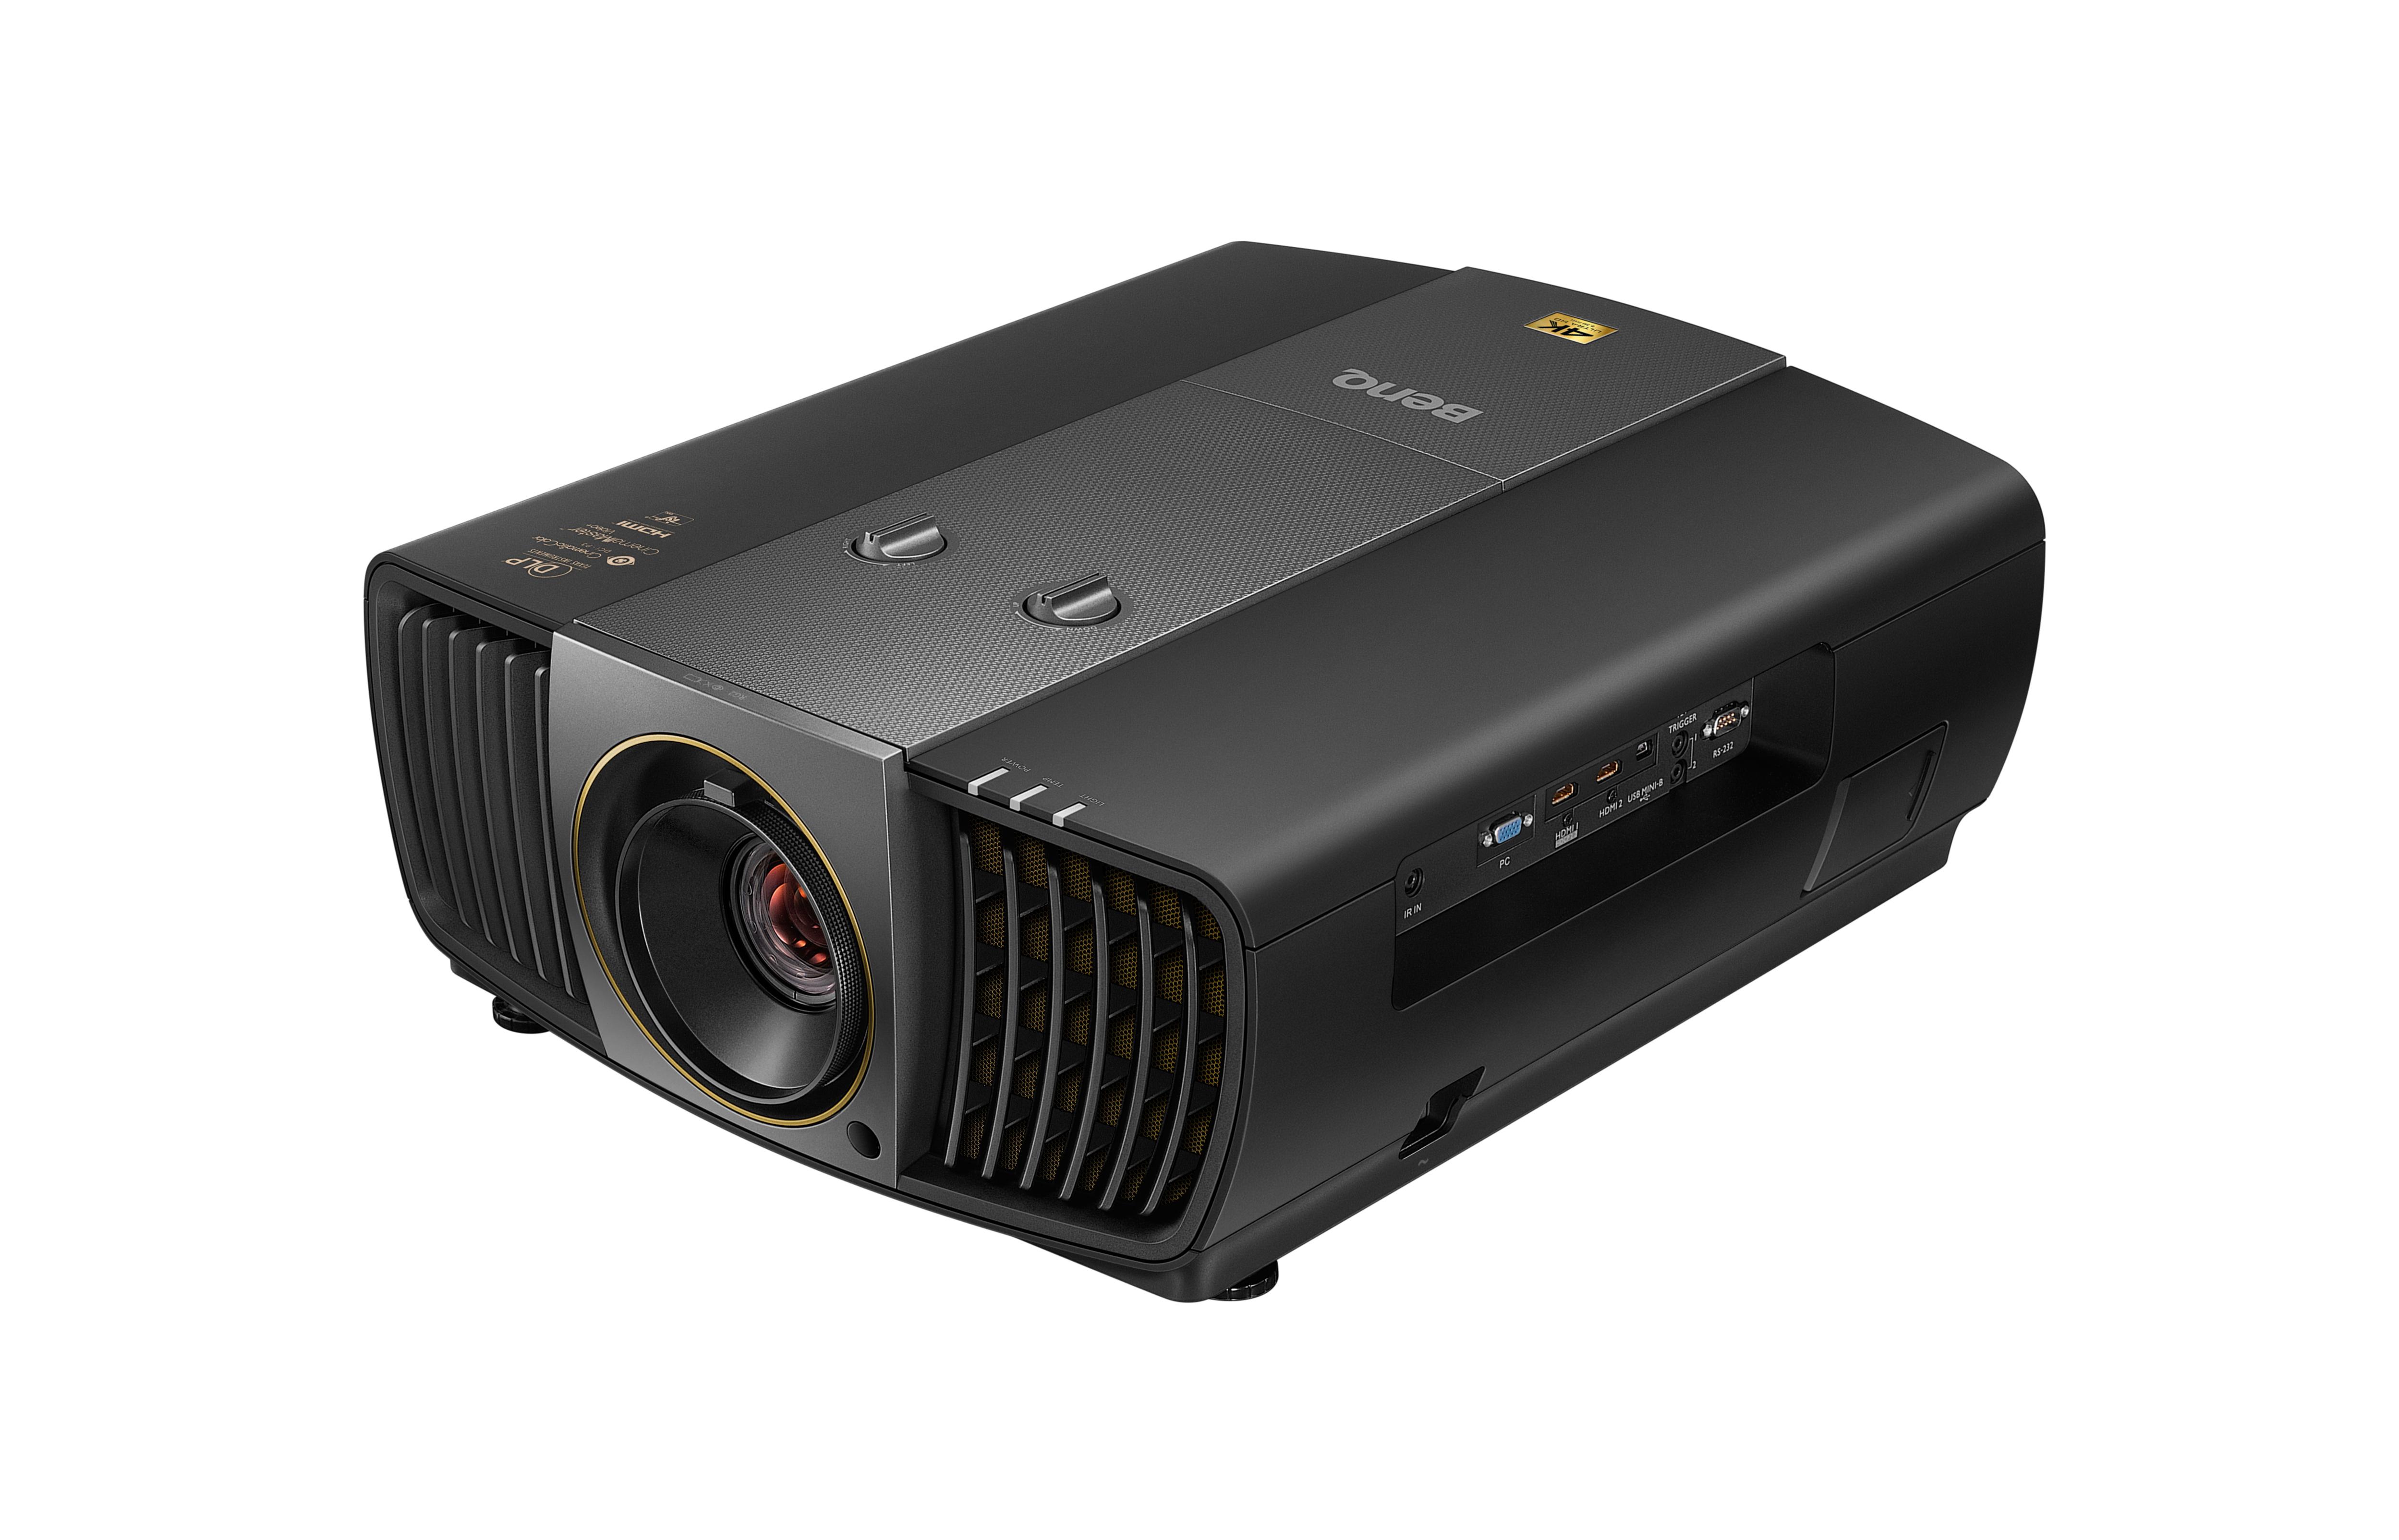 ویدیو پروژکتور بنکیو مدل X12000